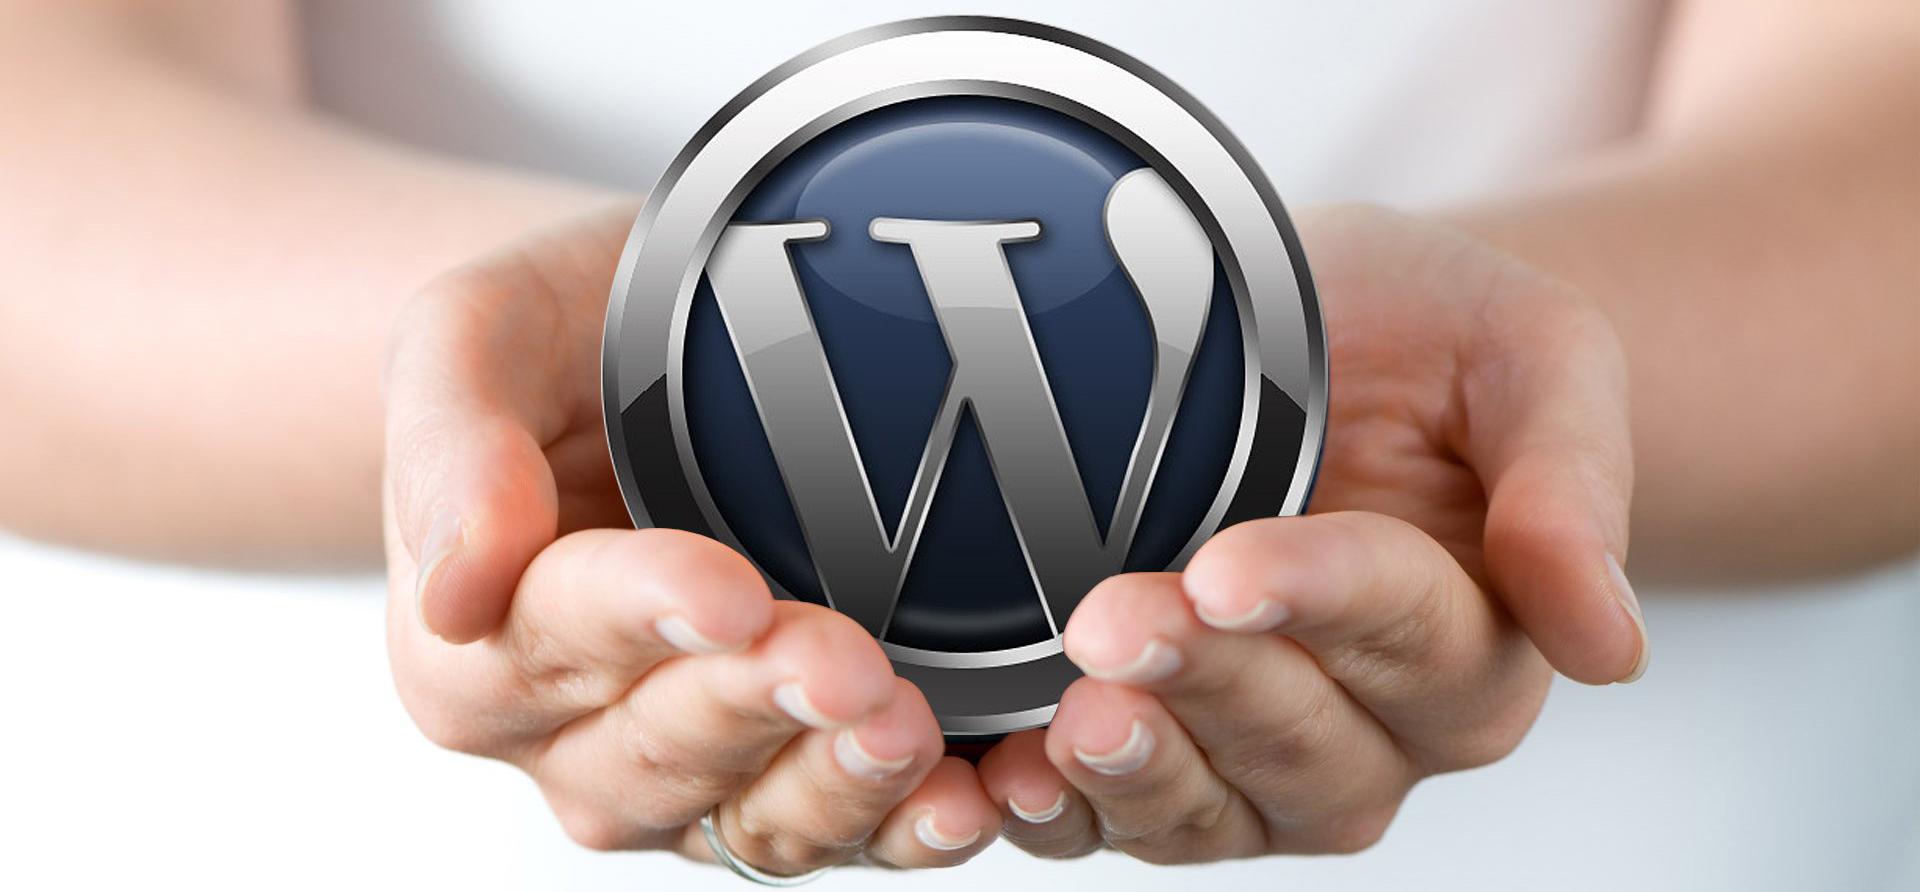 Image: hands holding WordPress logo ball